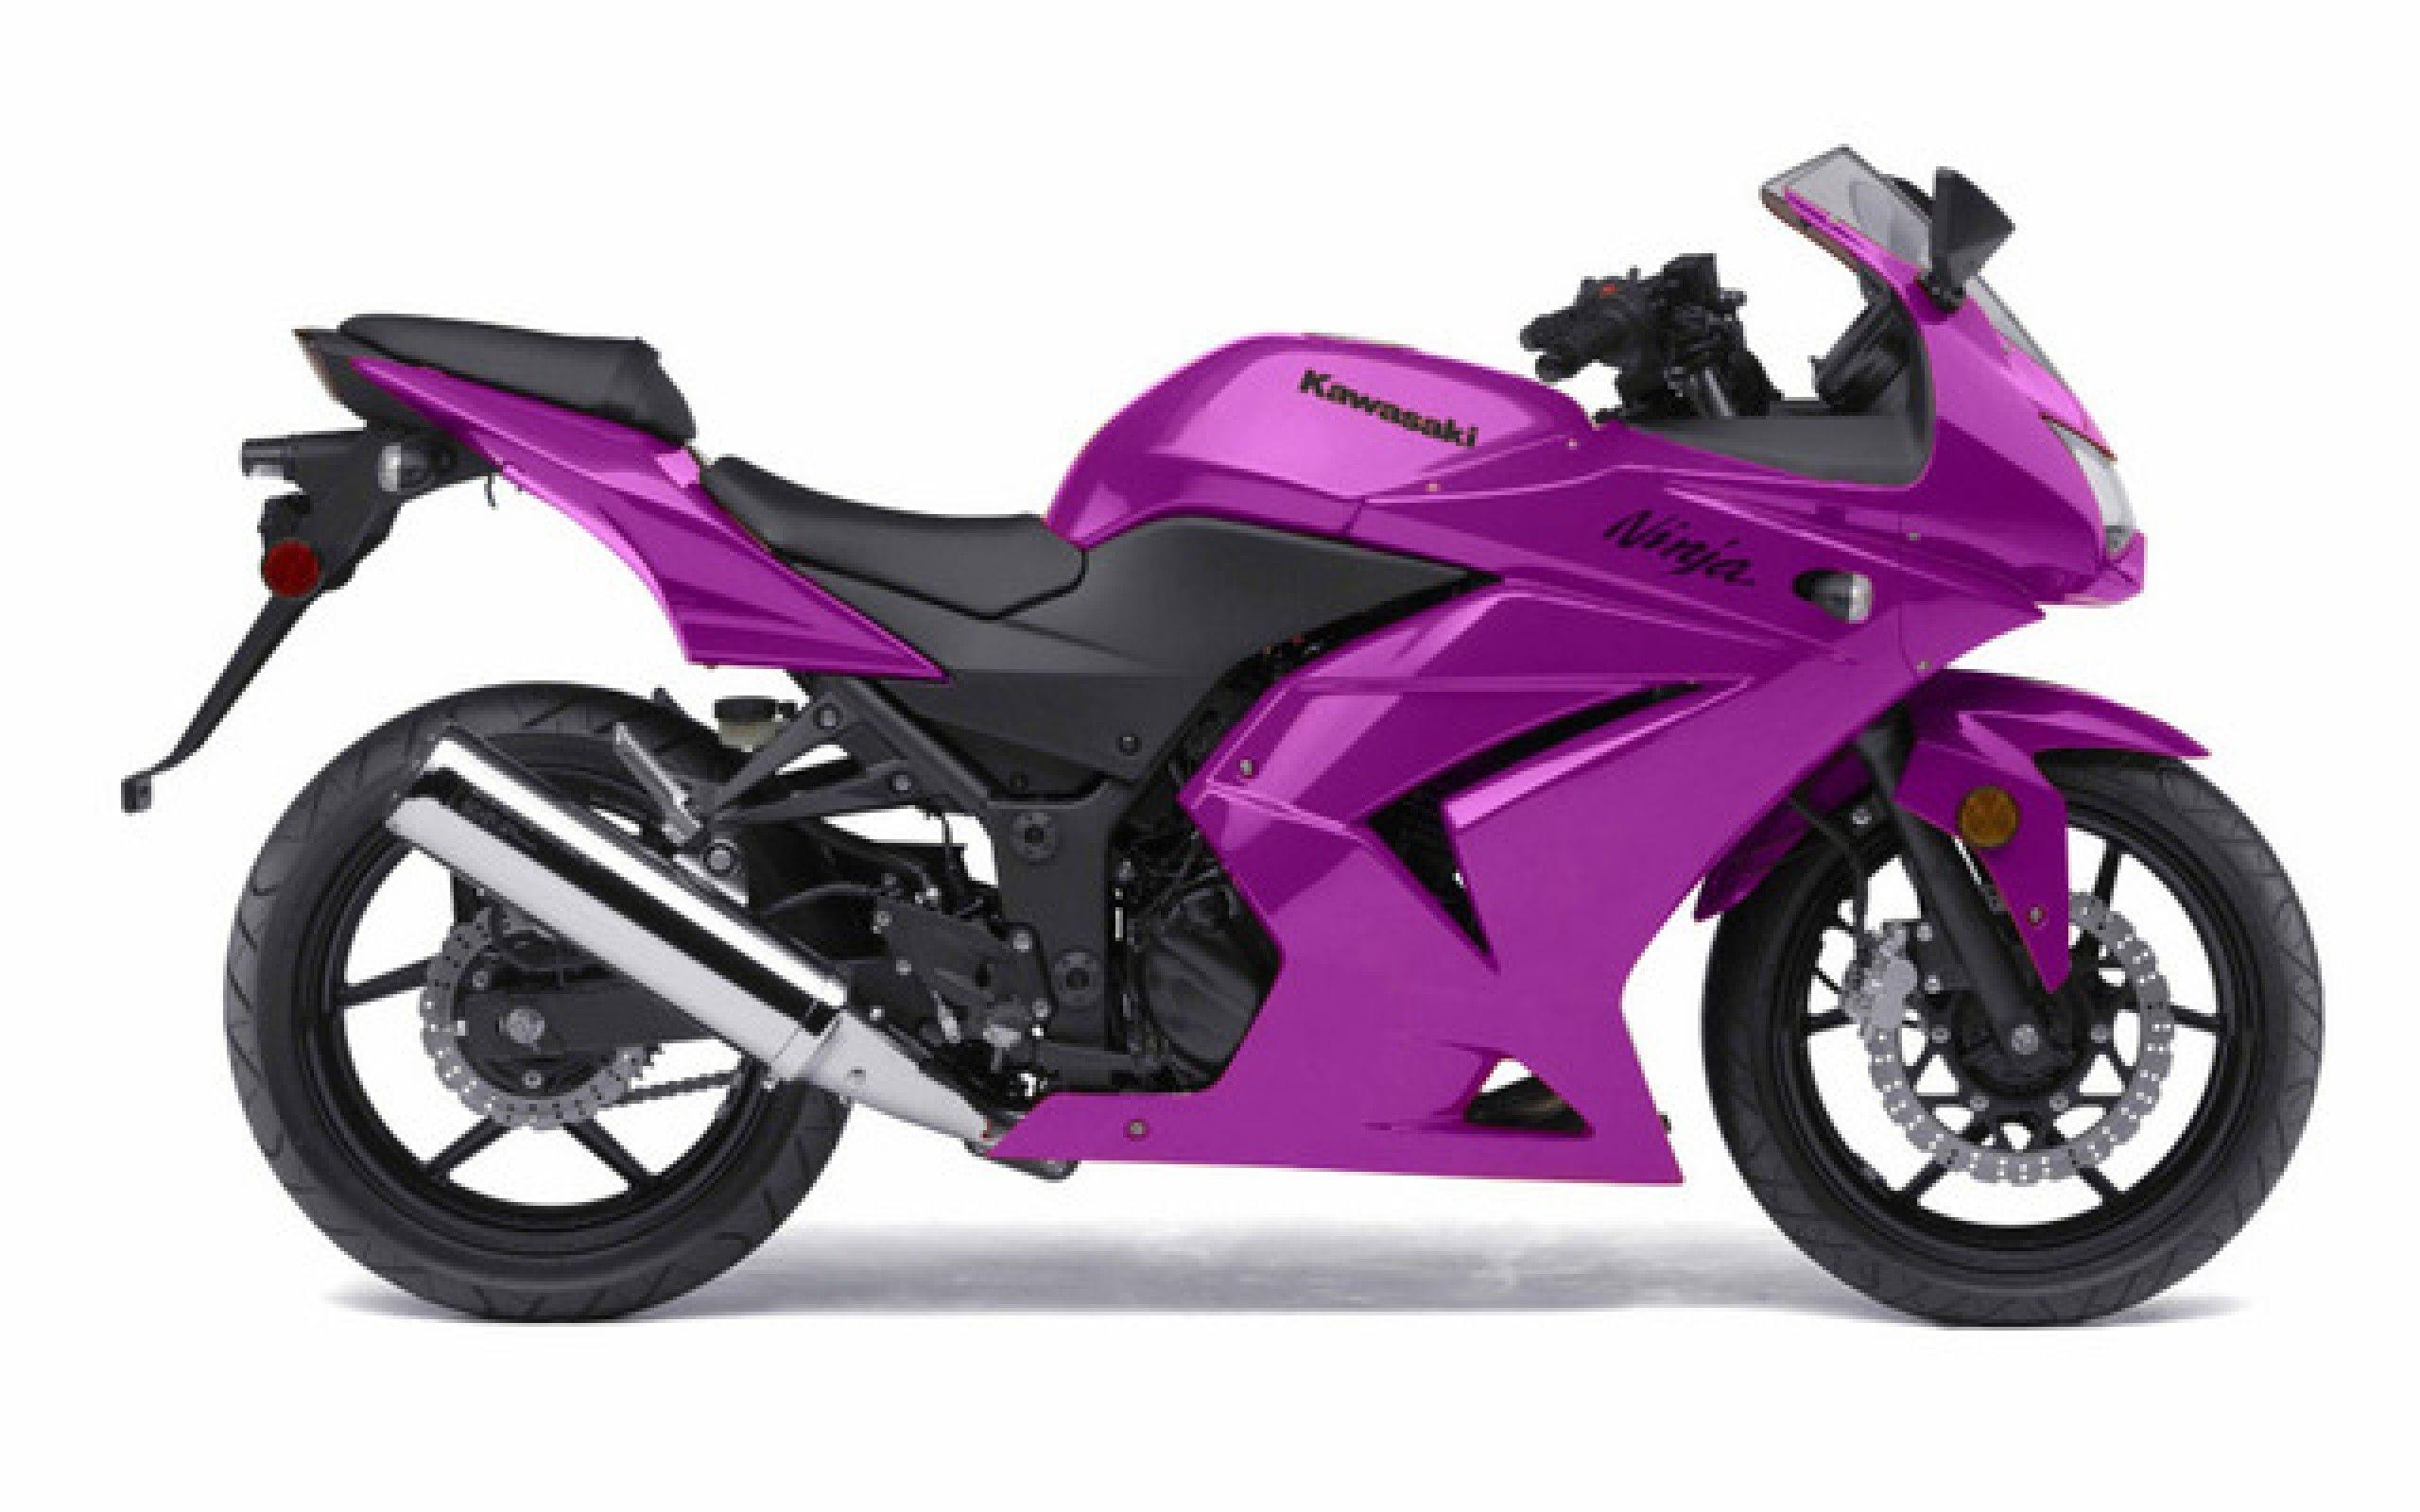 Kawasaki Ninja 250 In Purple Yes Please Kawasaki Ninja Purple Motorcycle Kawasaki Ninja 250r